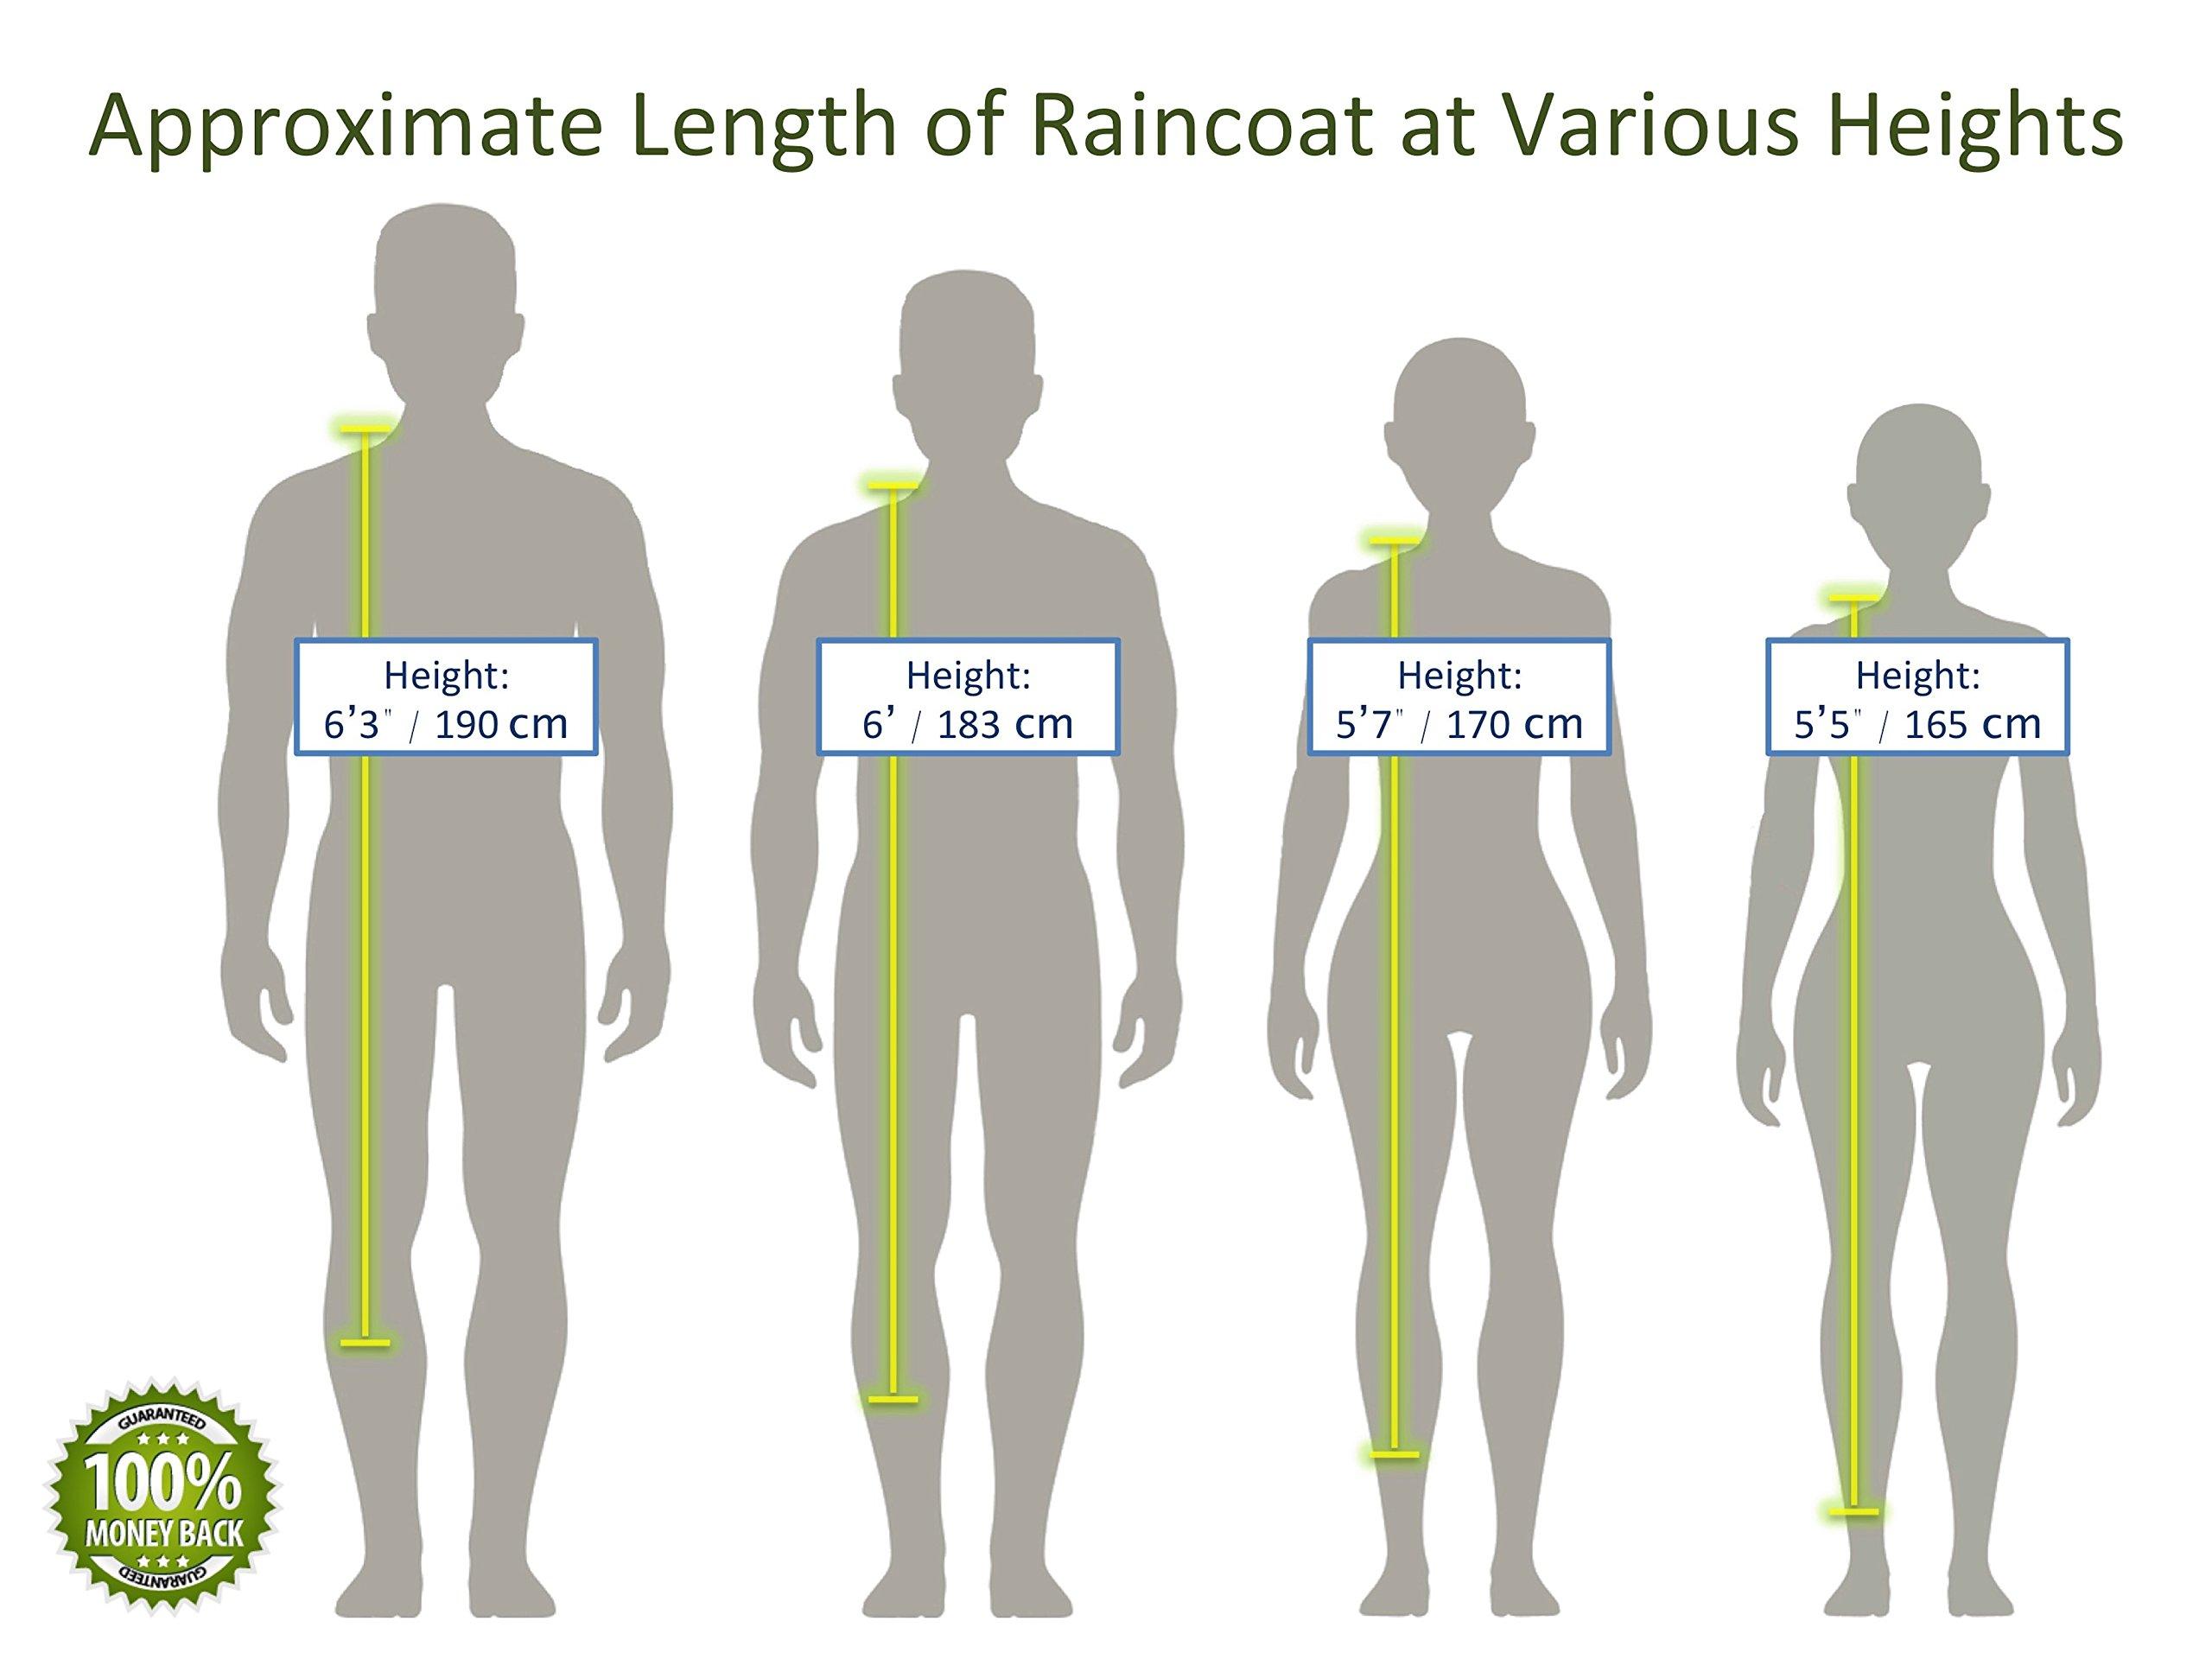 BlinQ Portable Rain Poncho Rain Jacket Raincoat with Drawstring Hood on